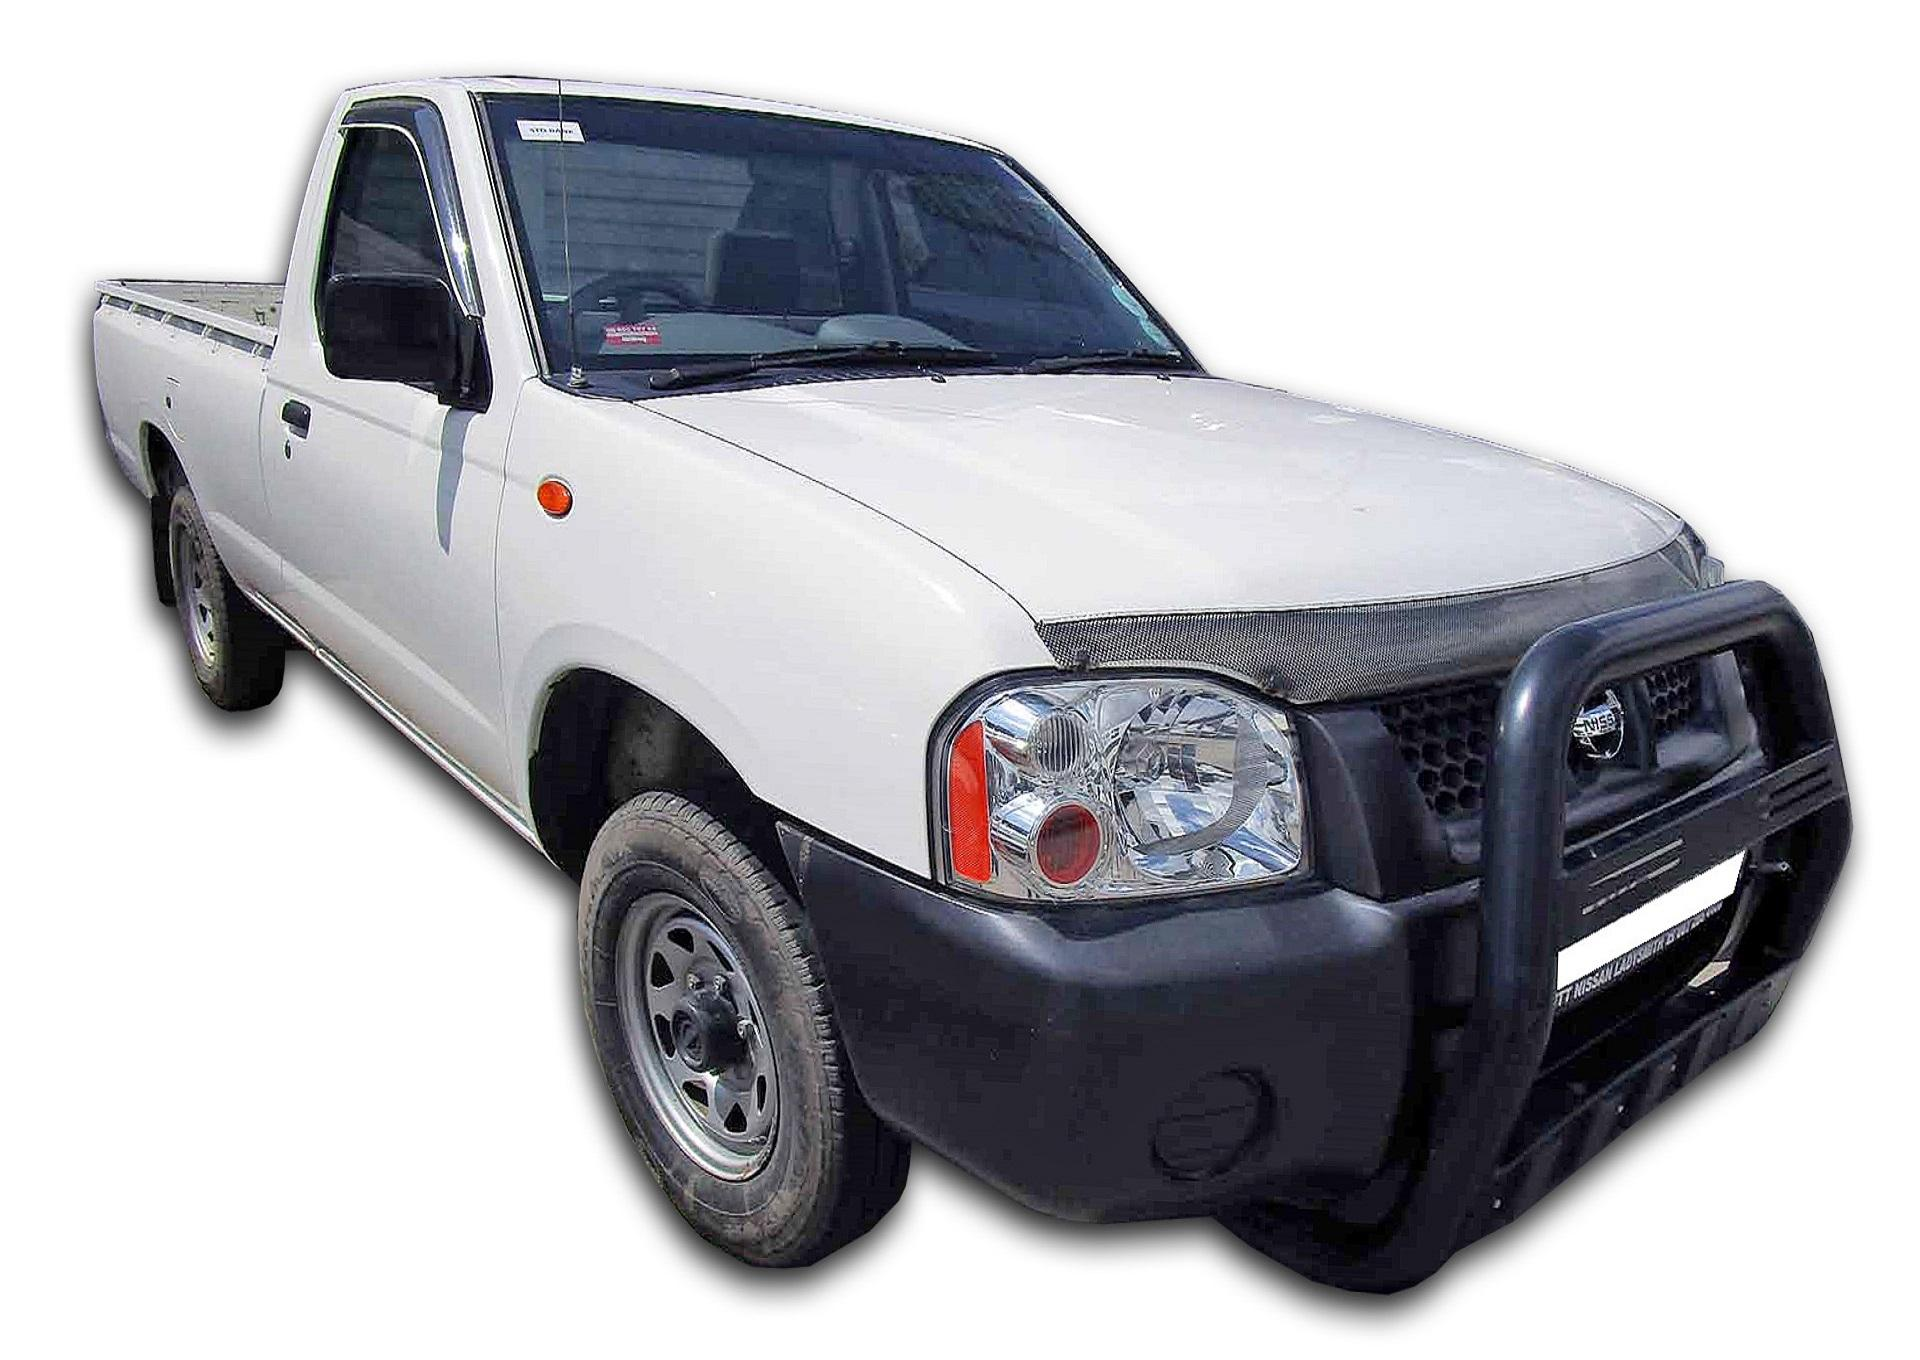 Nissan Hardbody NP300 2.0I